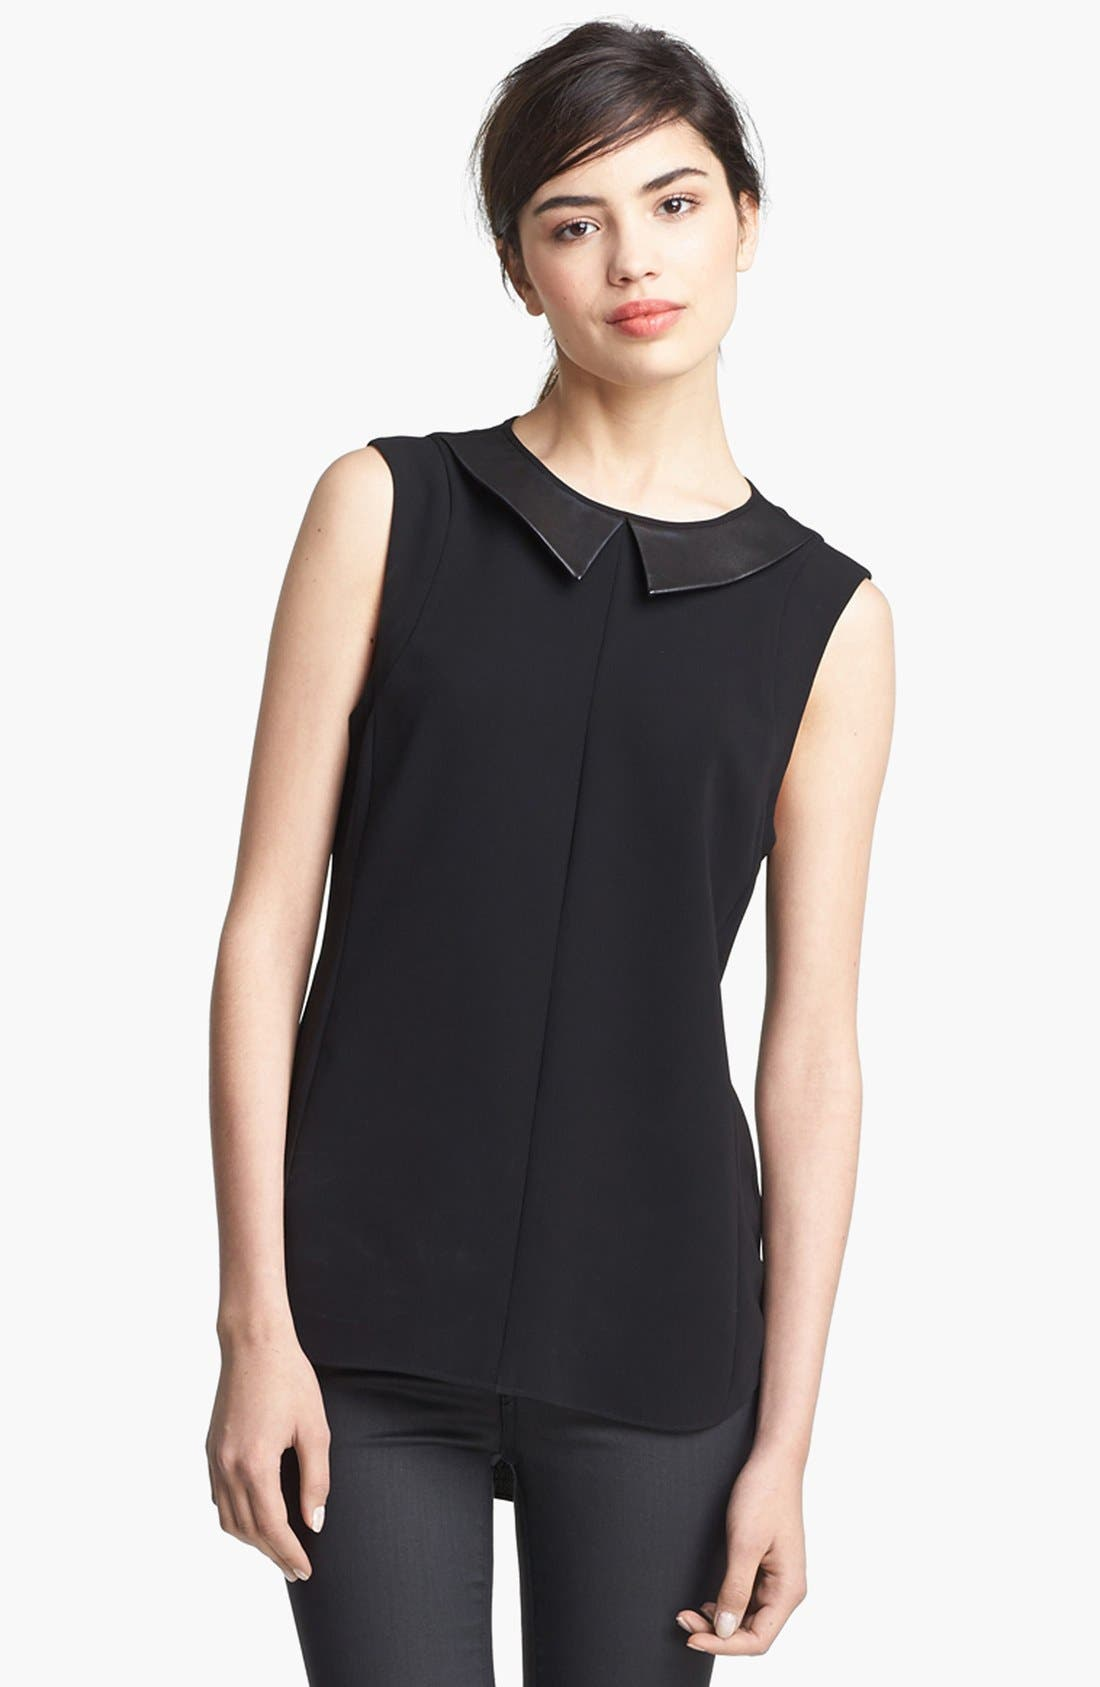 Alternate Image 1 Selected - rag & bone 'Astrid' Leather Collar Top